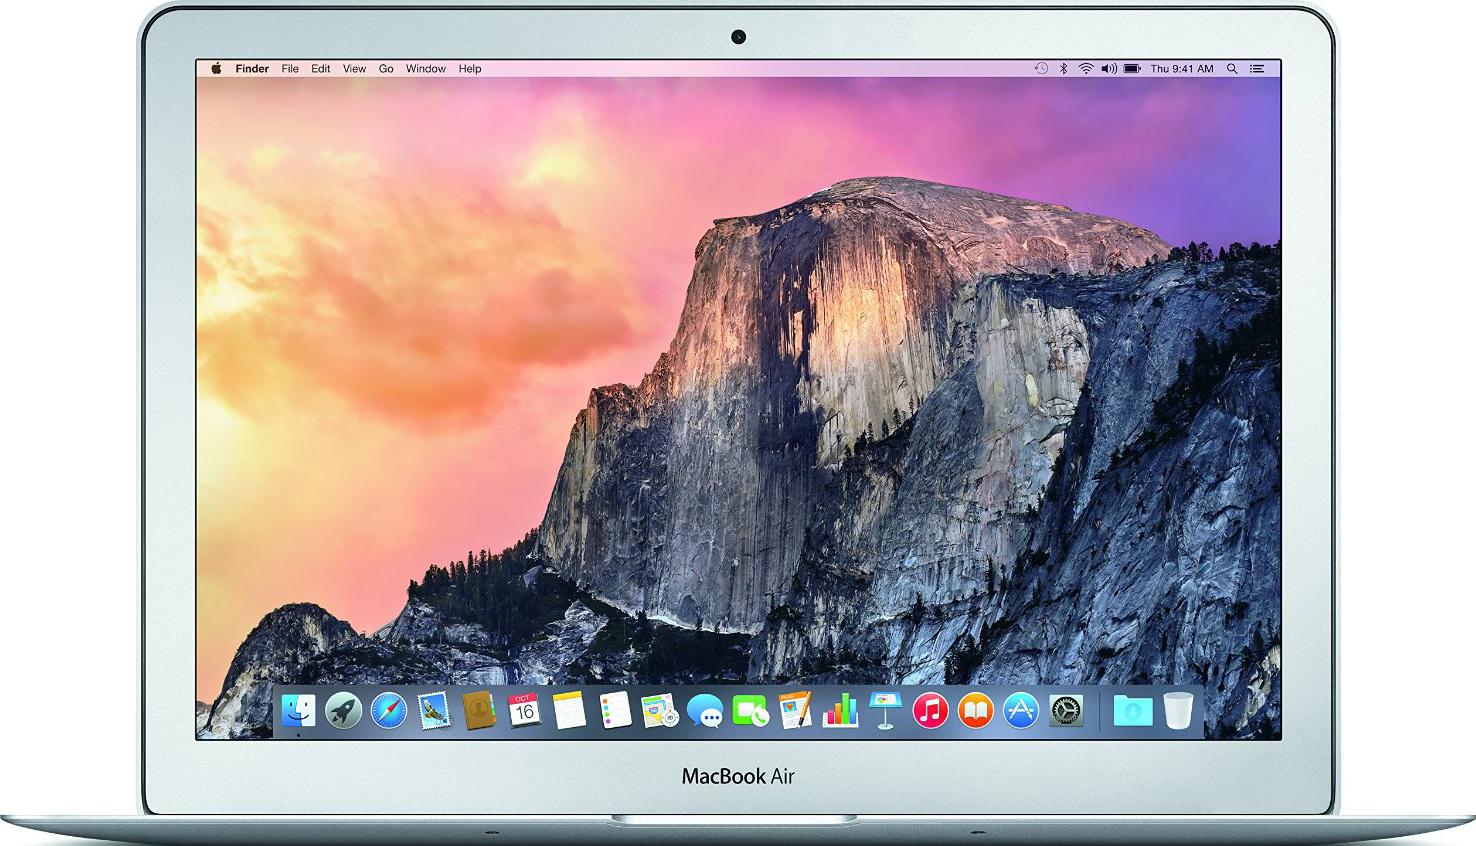 Apple MacBook Air 13 inch MJVE2 - CellphoneS